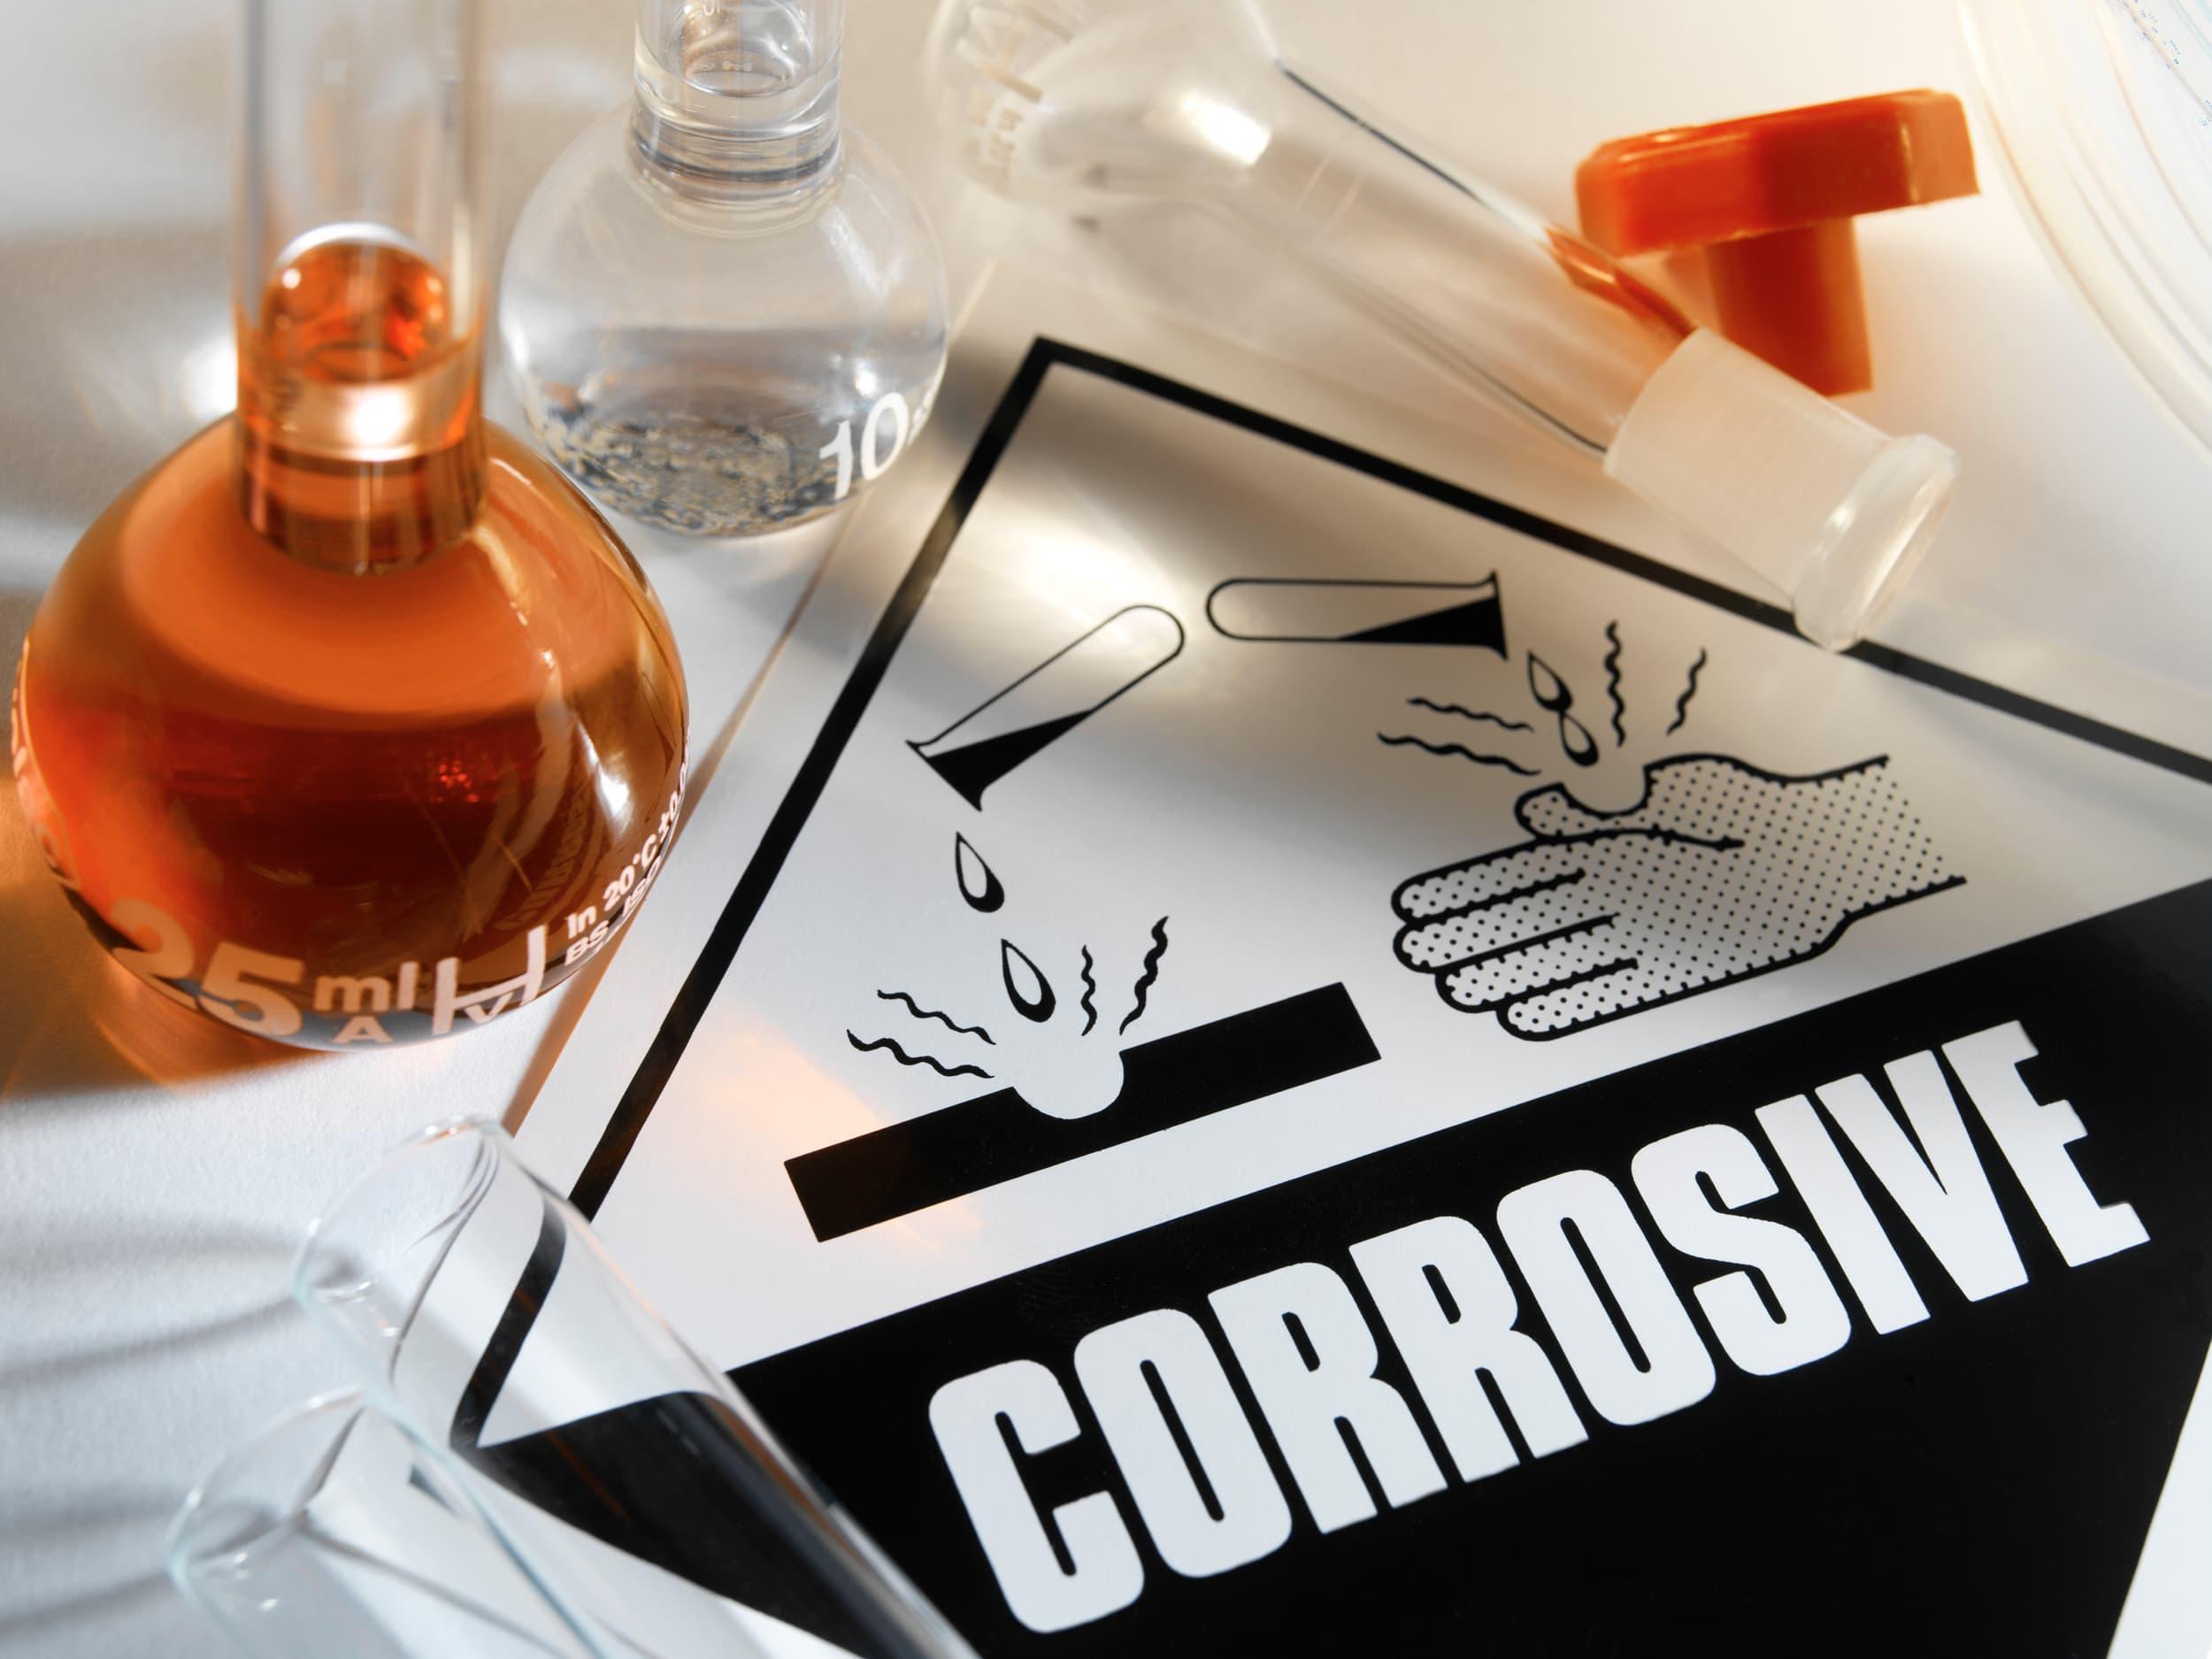 Compliance Training Online IATA DGR Class 8 Corrosives course